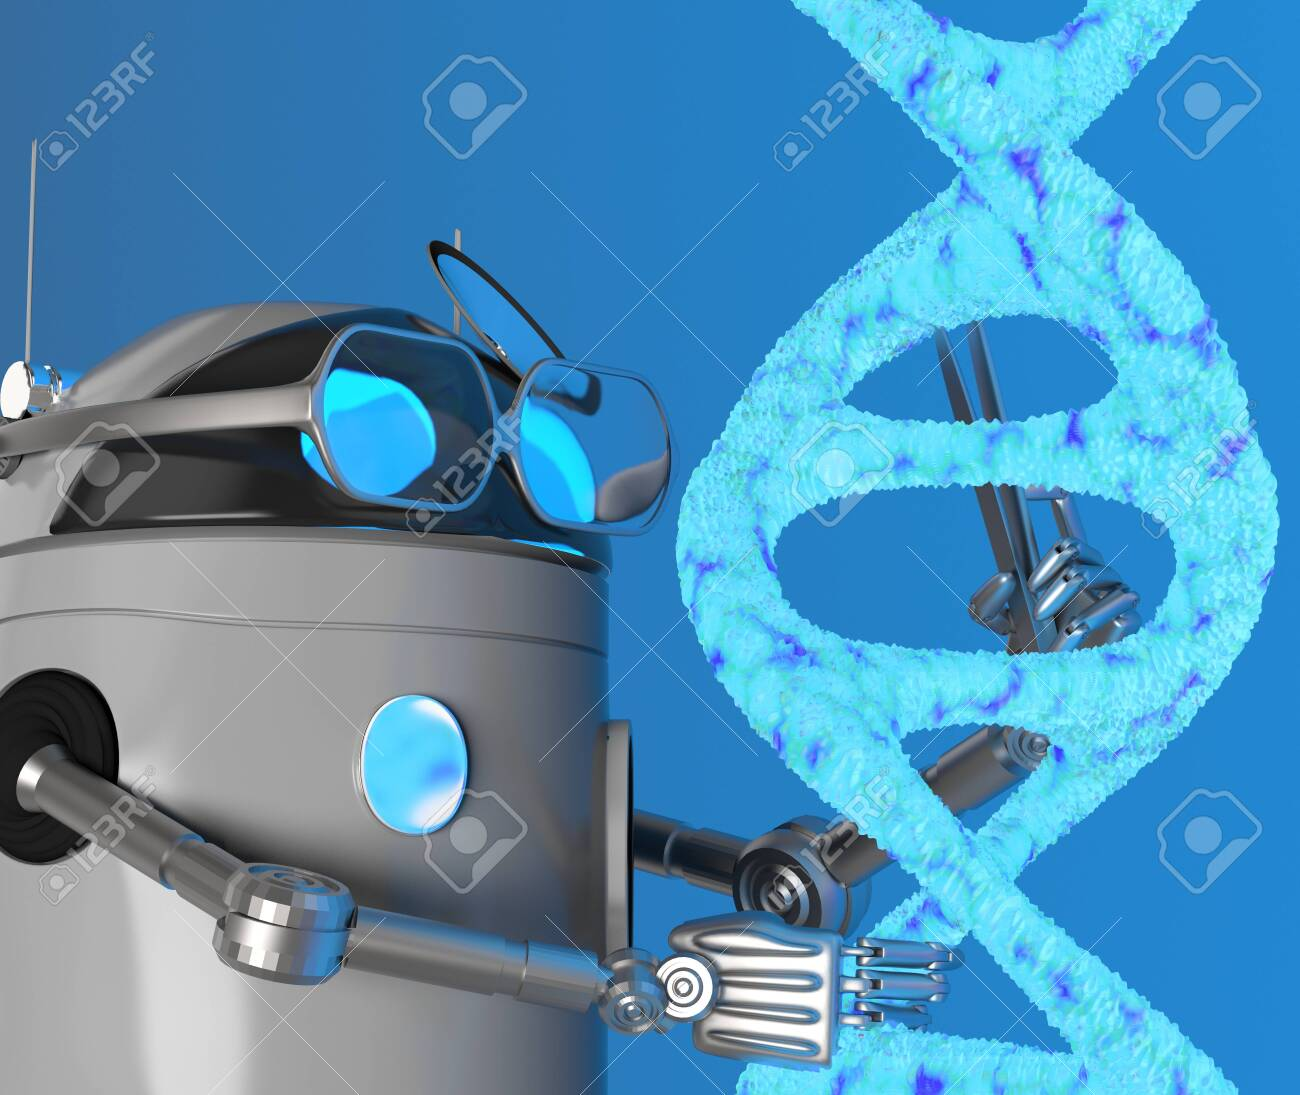 The robot fix Blue Dna molecule,text,3d render. - 131122247